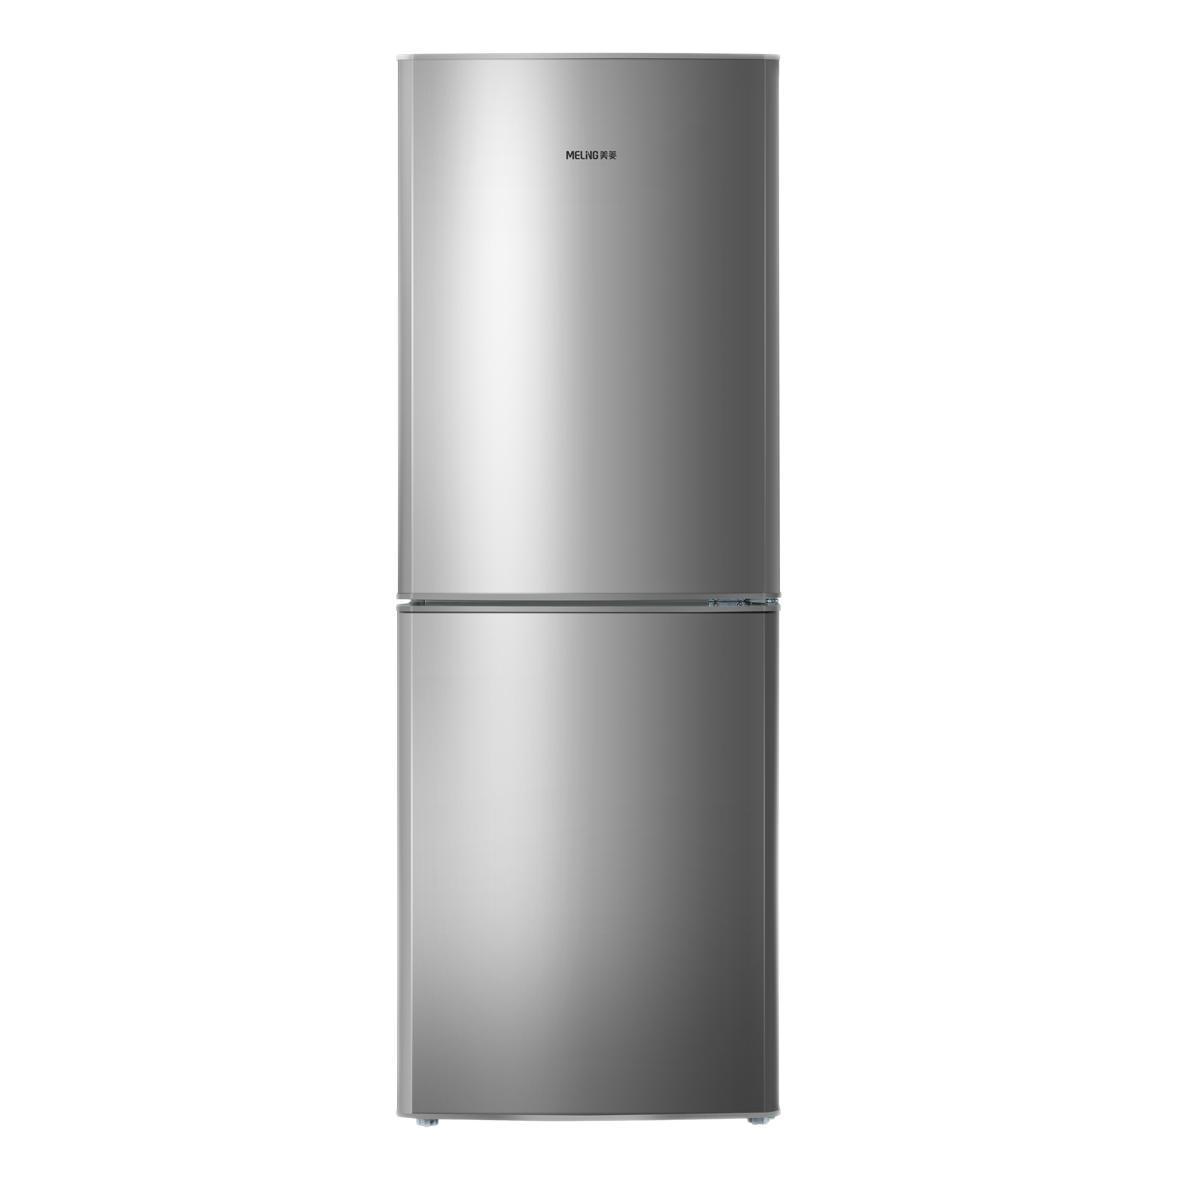 MELING 美菱 BCD-170LCX 直冷双门冰箱 170L 银色